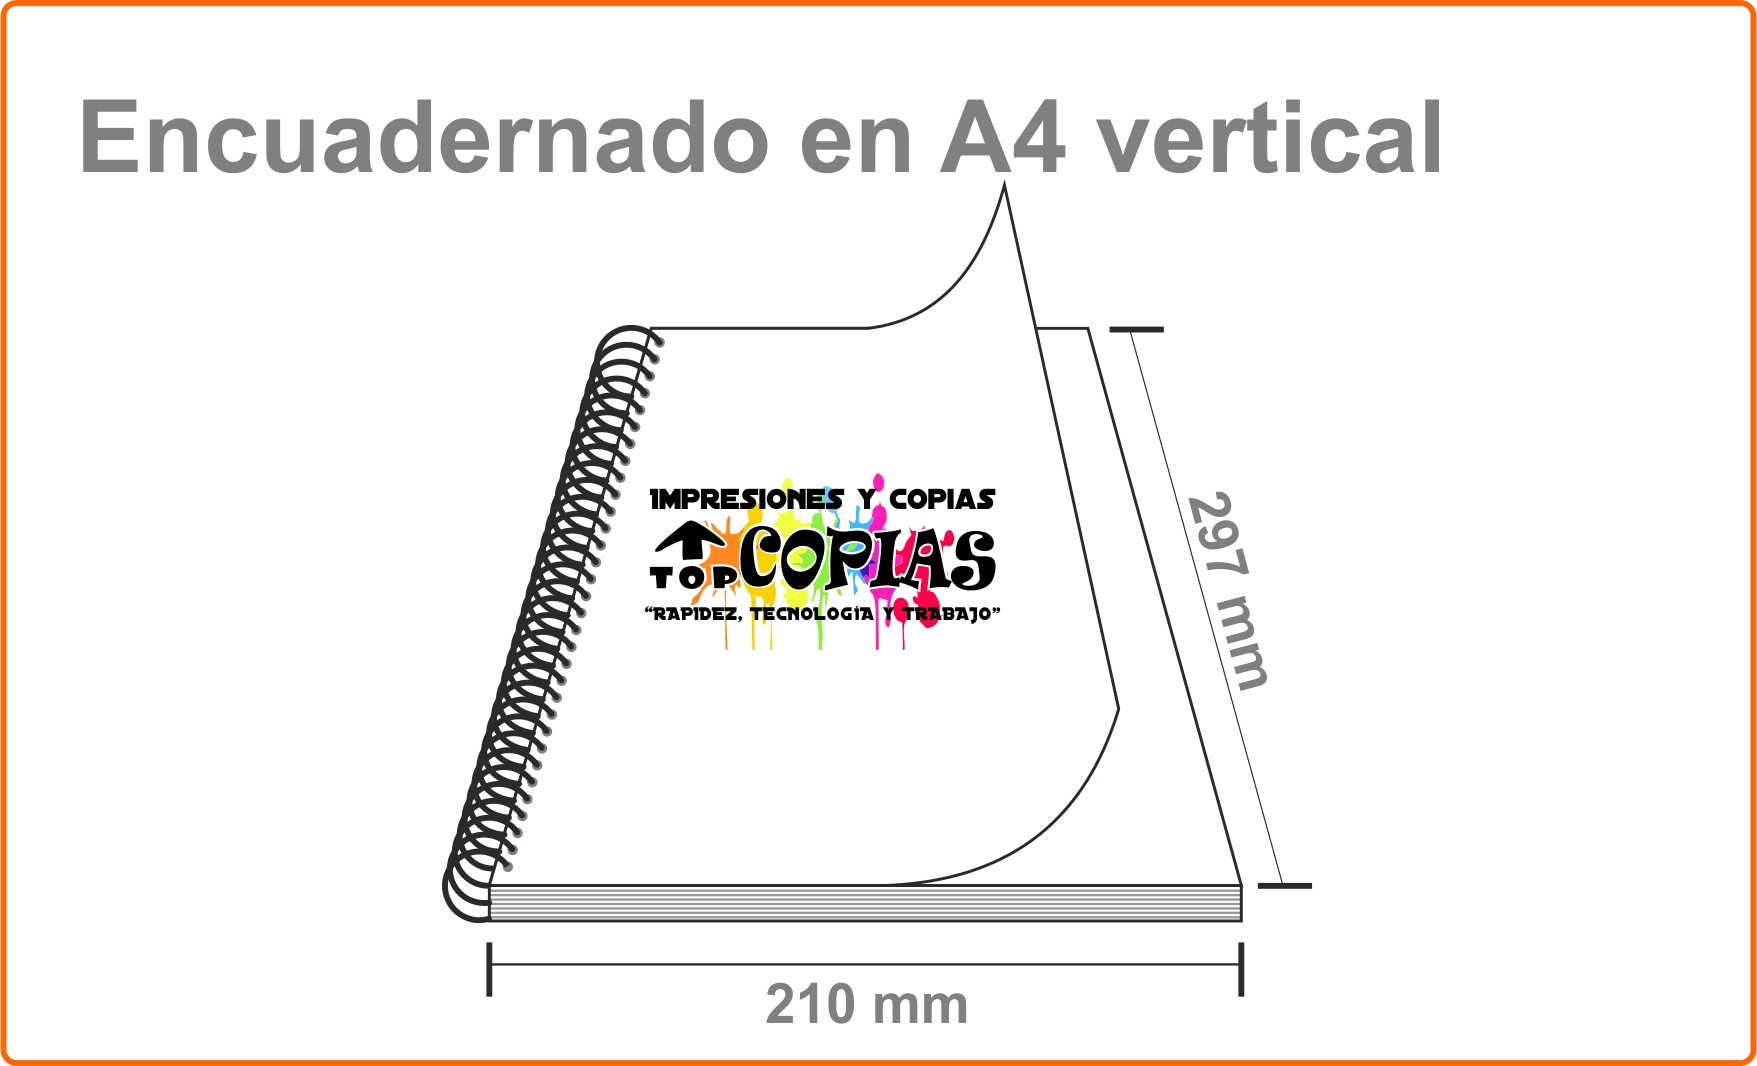 Encuadernado vertical